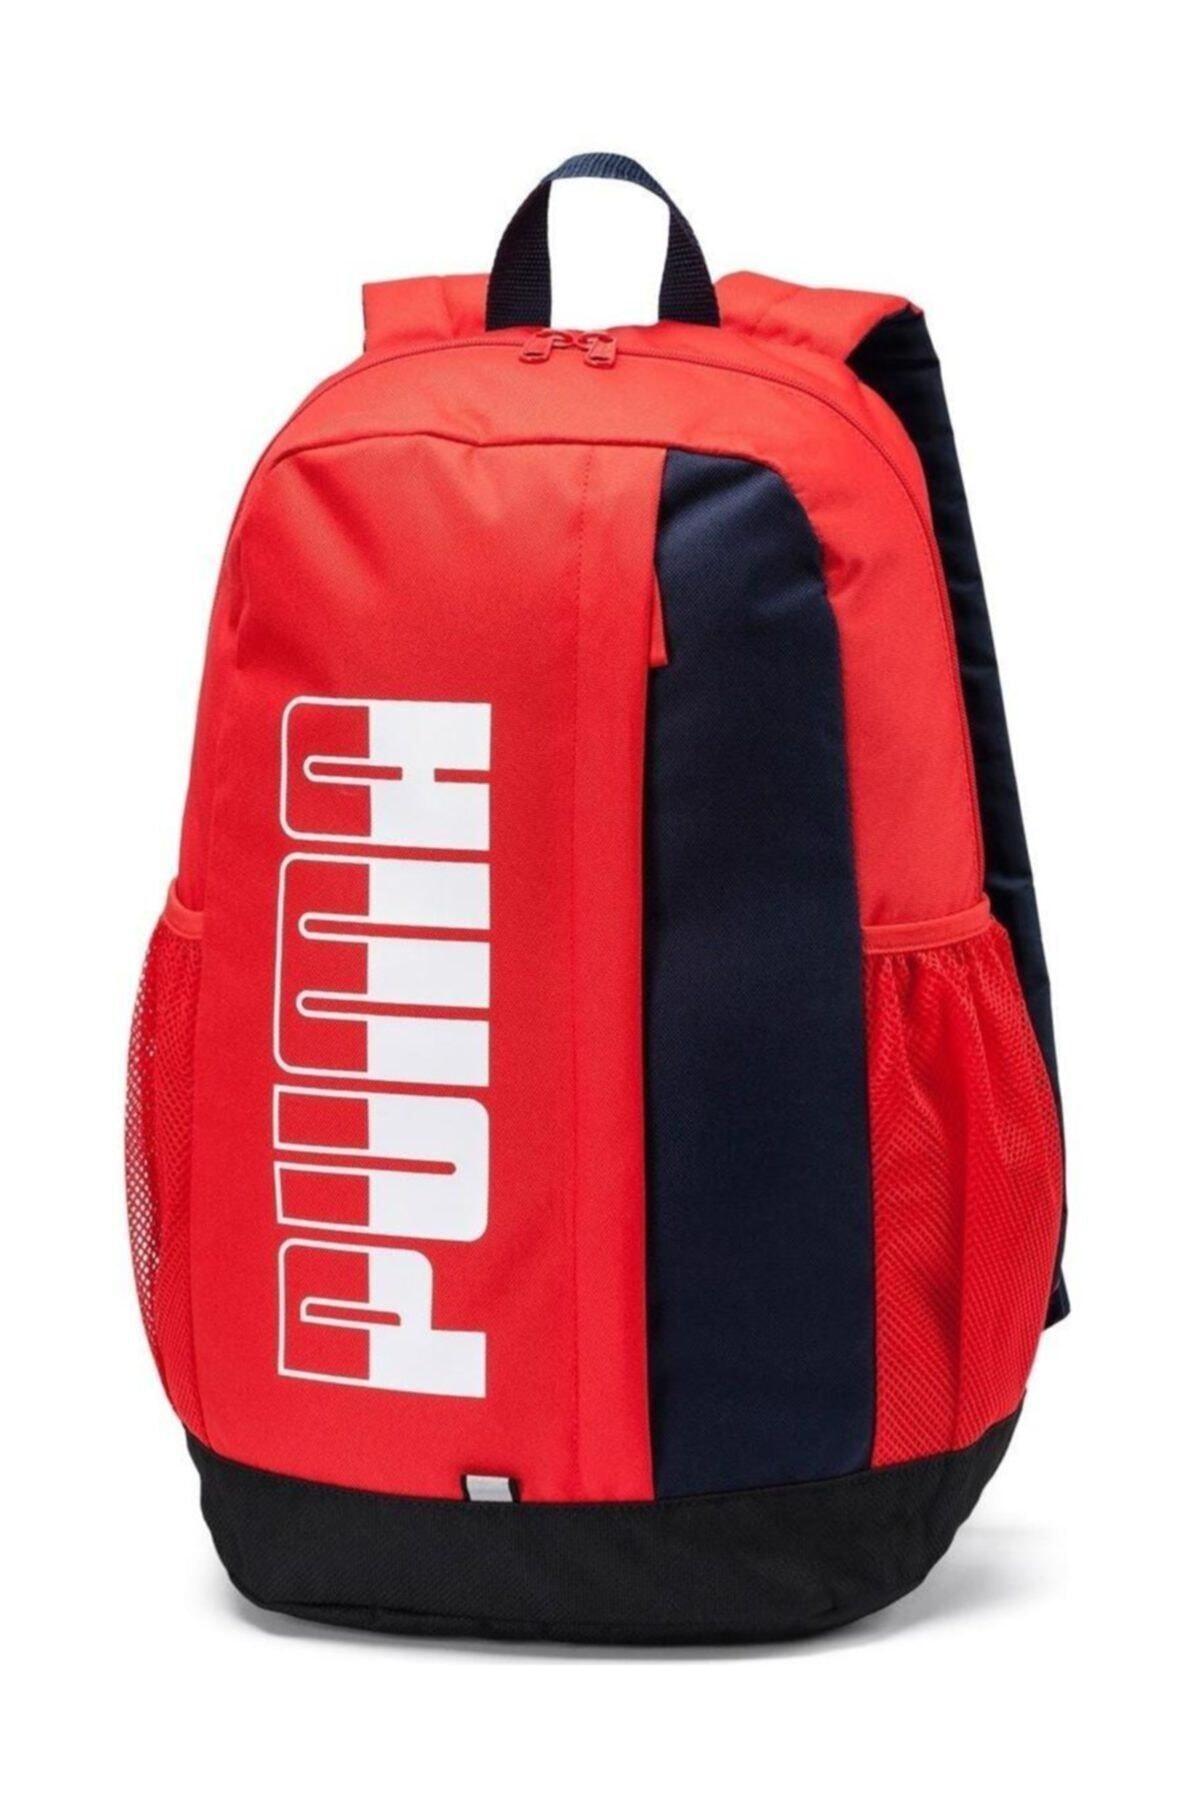 Puma Plus Iı Sırt Çantası 07574903 1